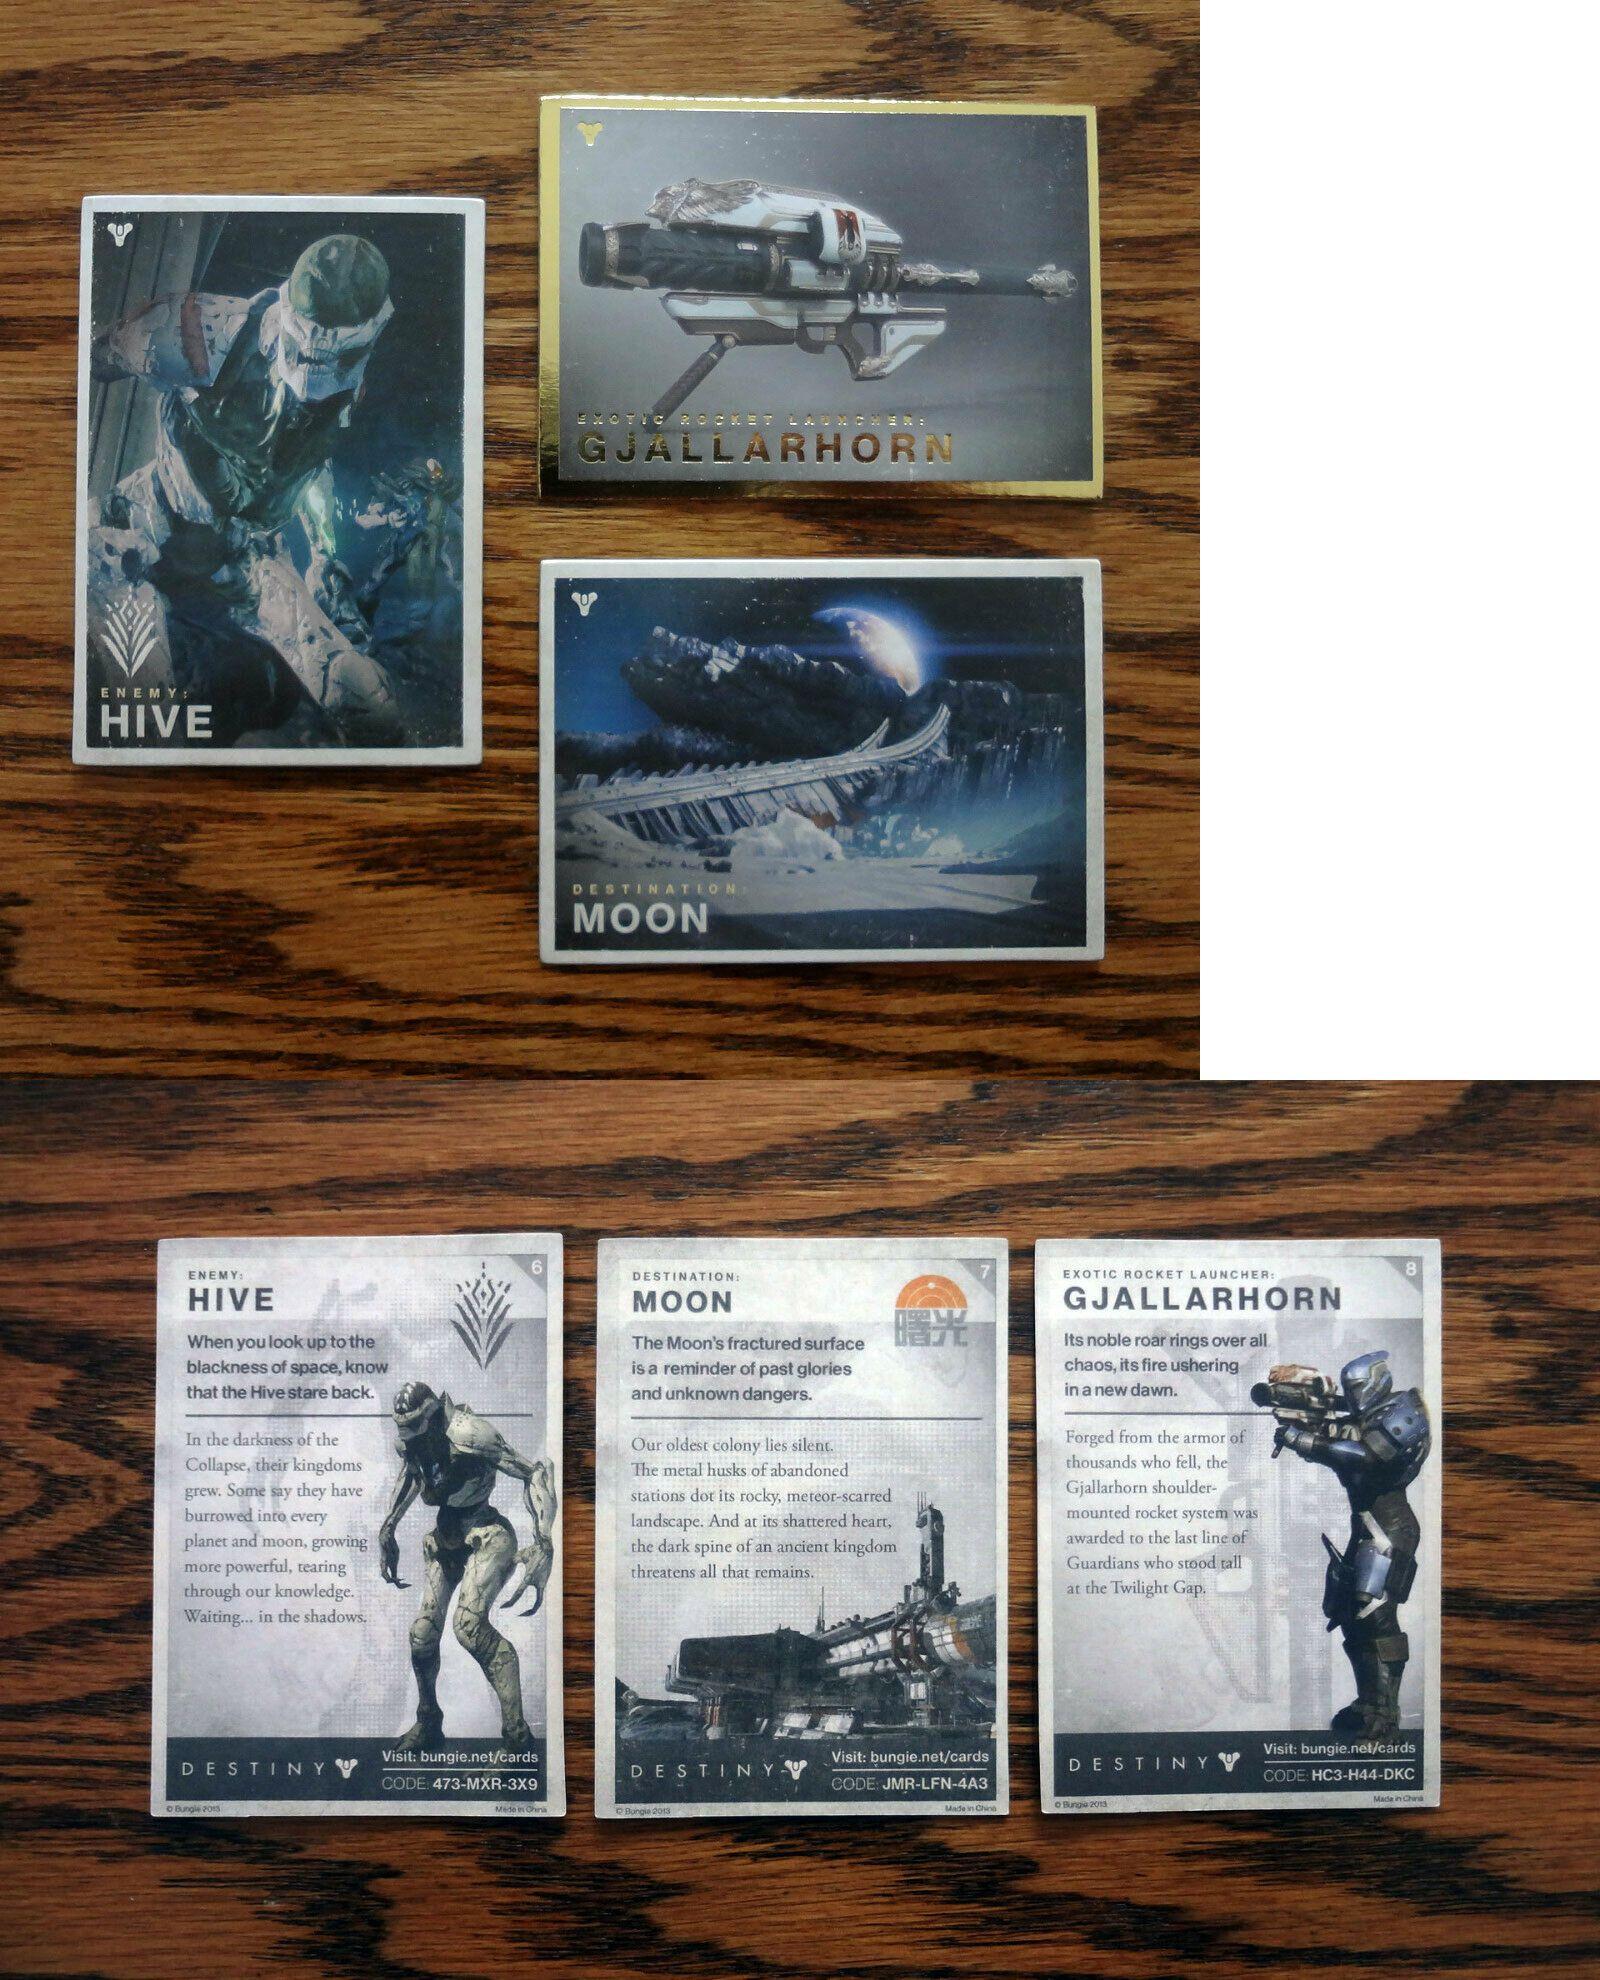 Video Game Merchandise 38583: Destiny Promo Egx Collectible